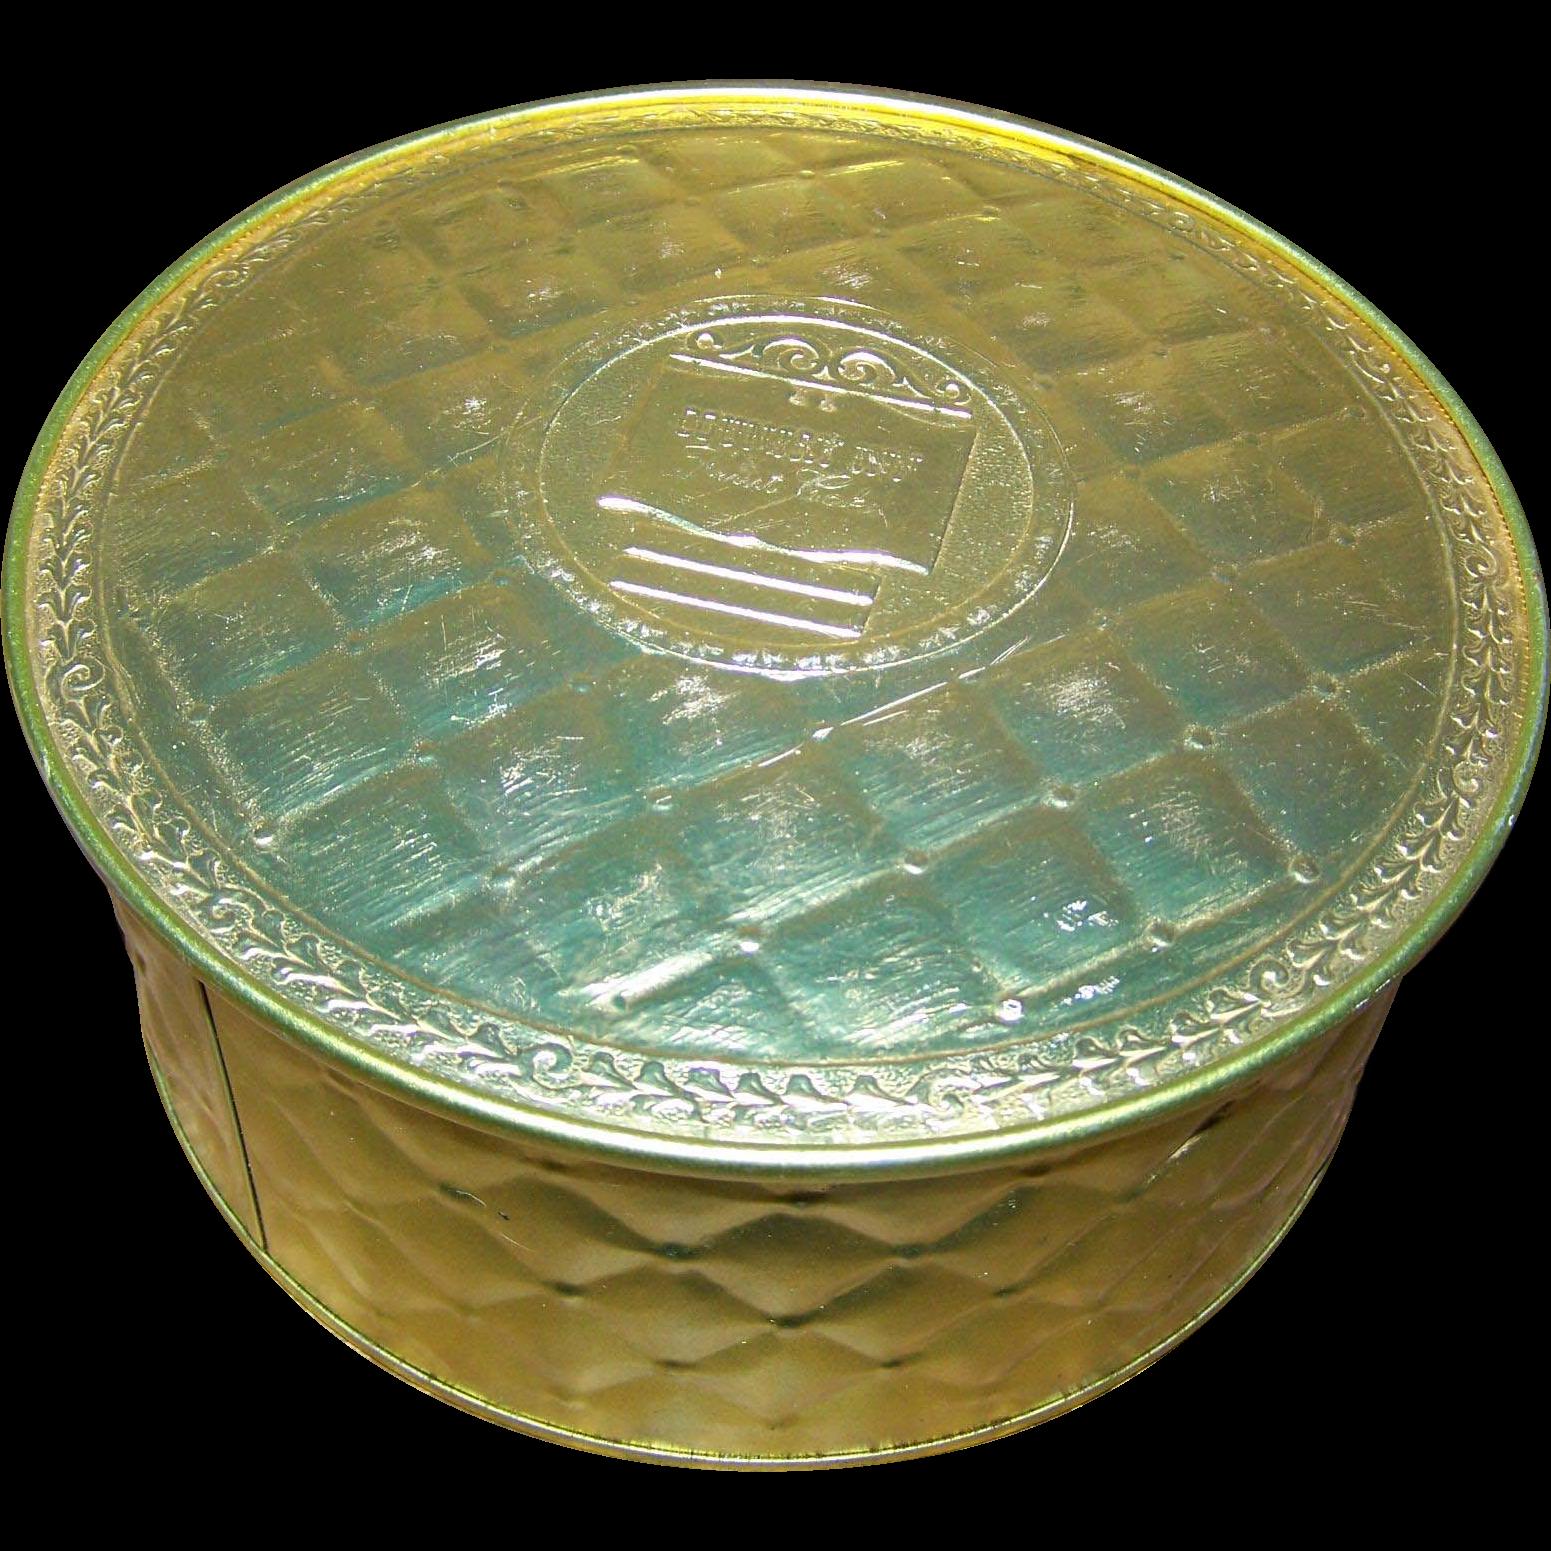 Vintage Fruit Cake Tins For Baking